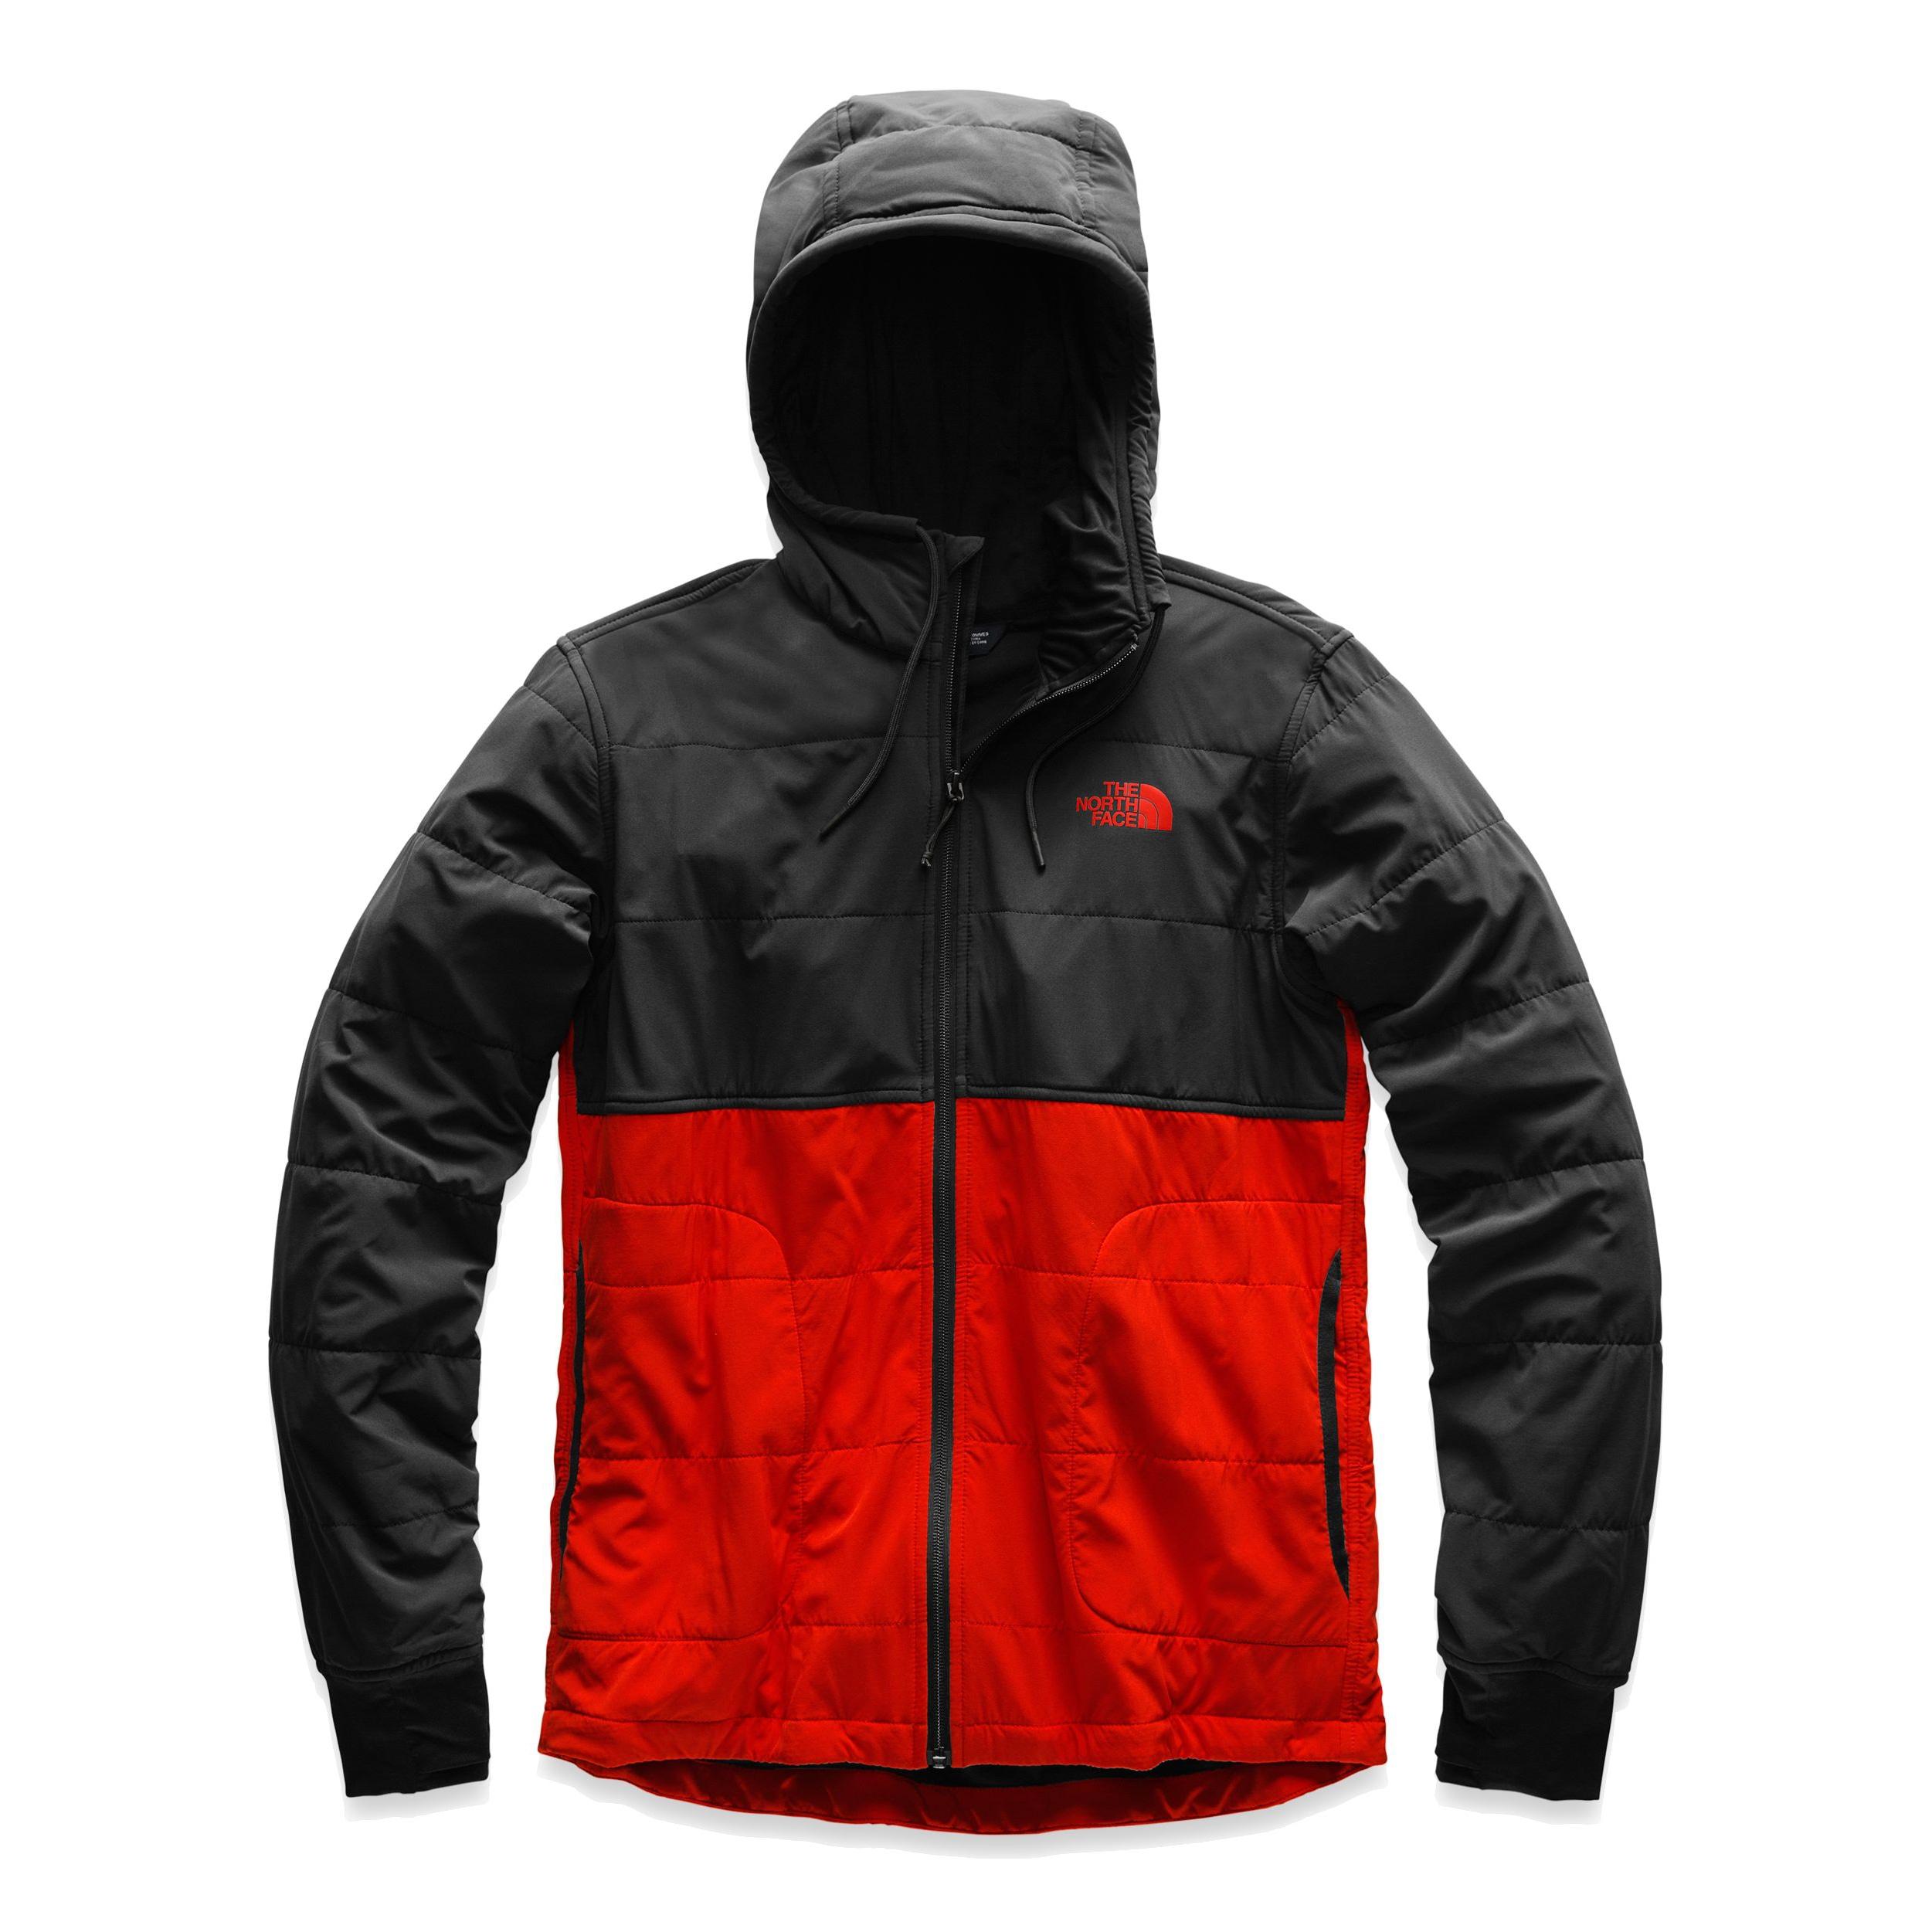 Mountain Sweatshirt 2.0 - Men's